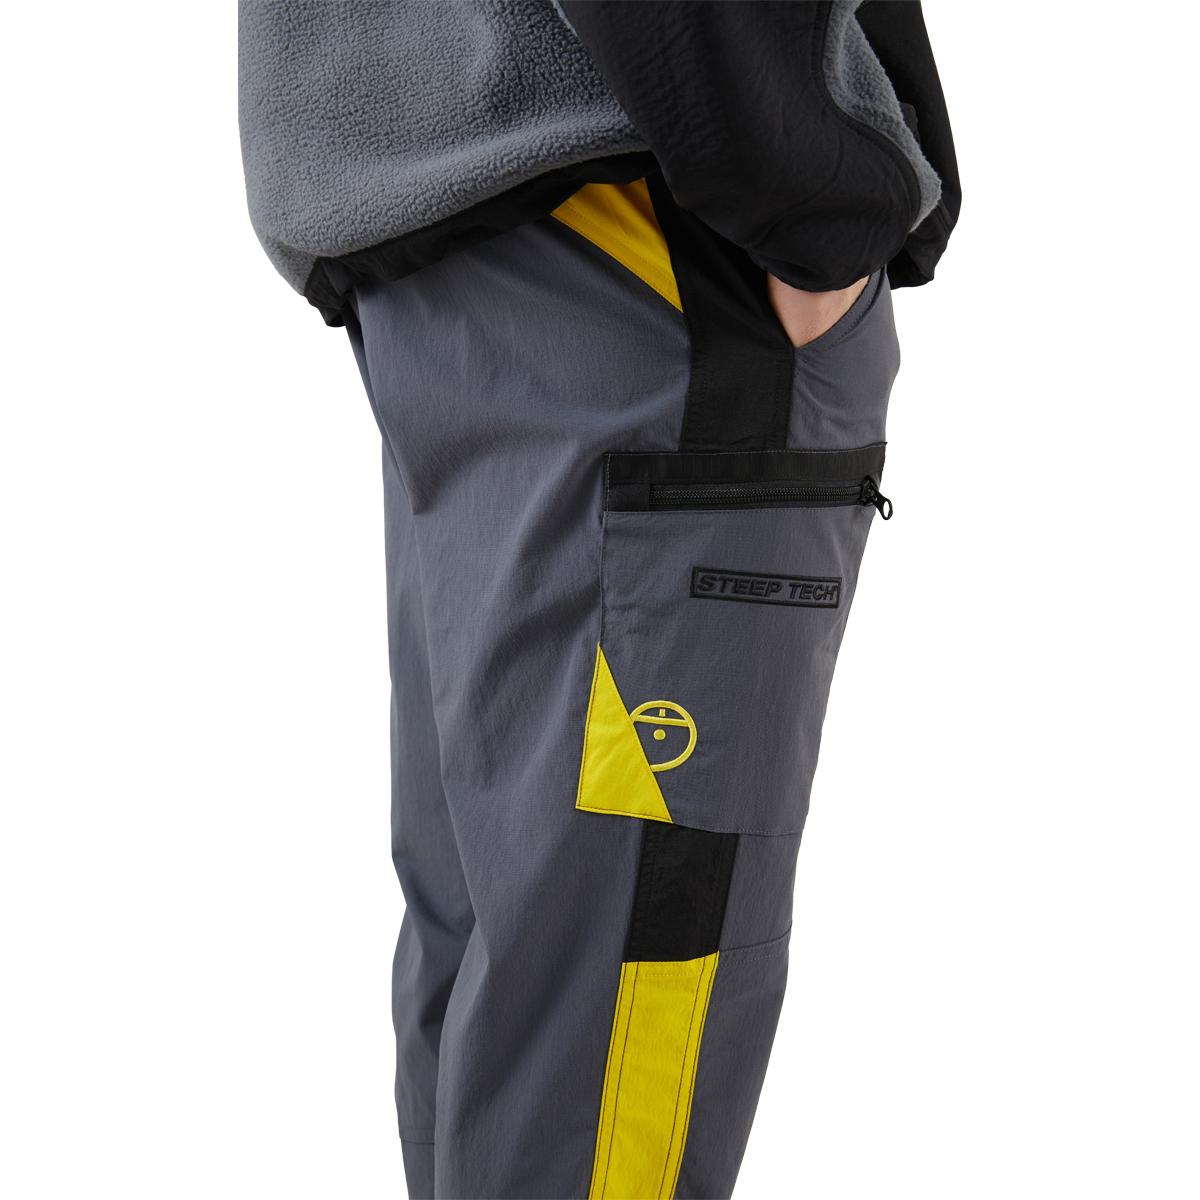 The North Face STP Tech Pants